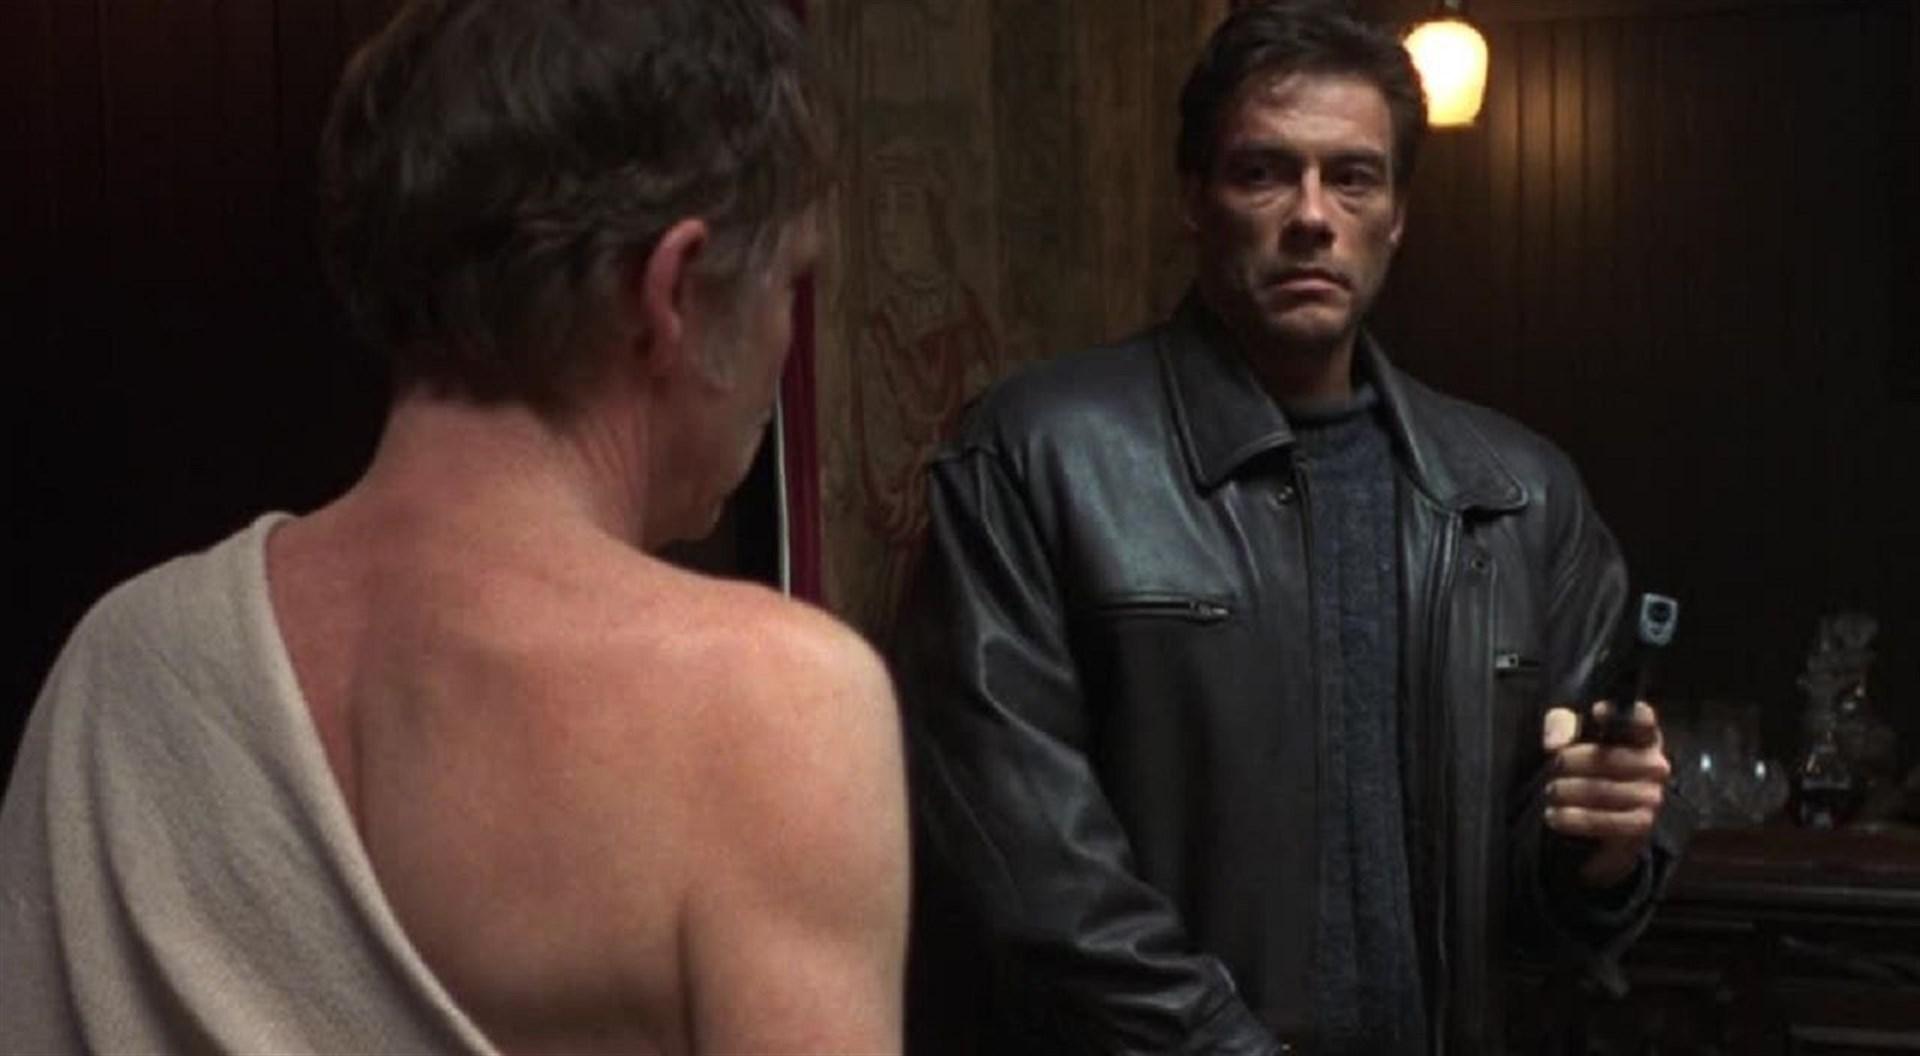 Fracasso de Jean-Claude Van Damme ganha nova chance na Netflix